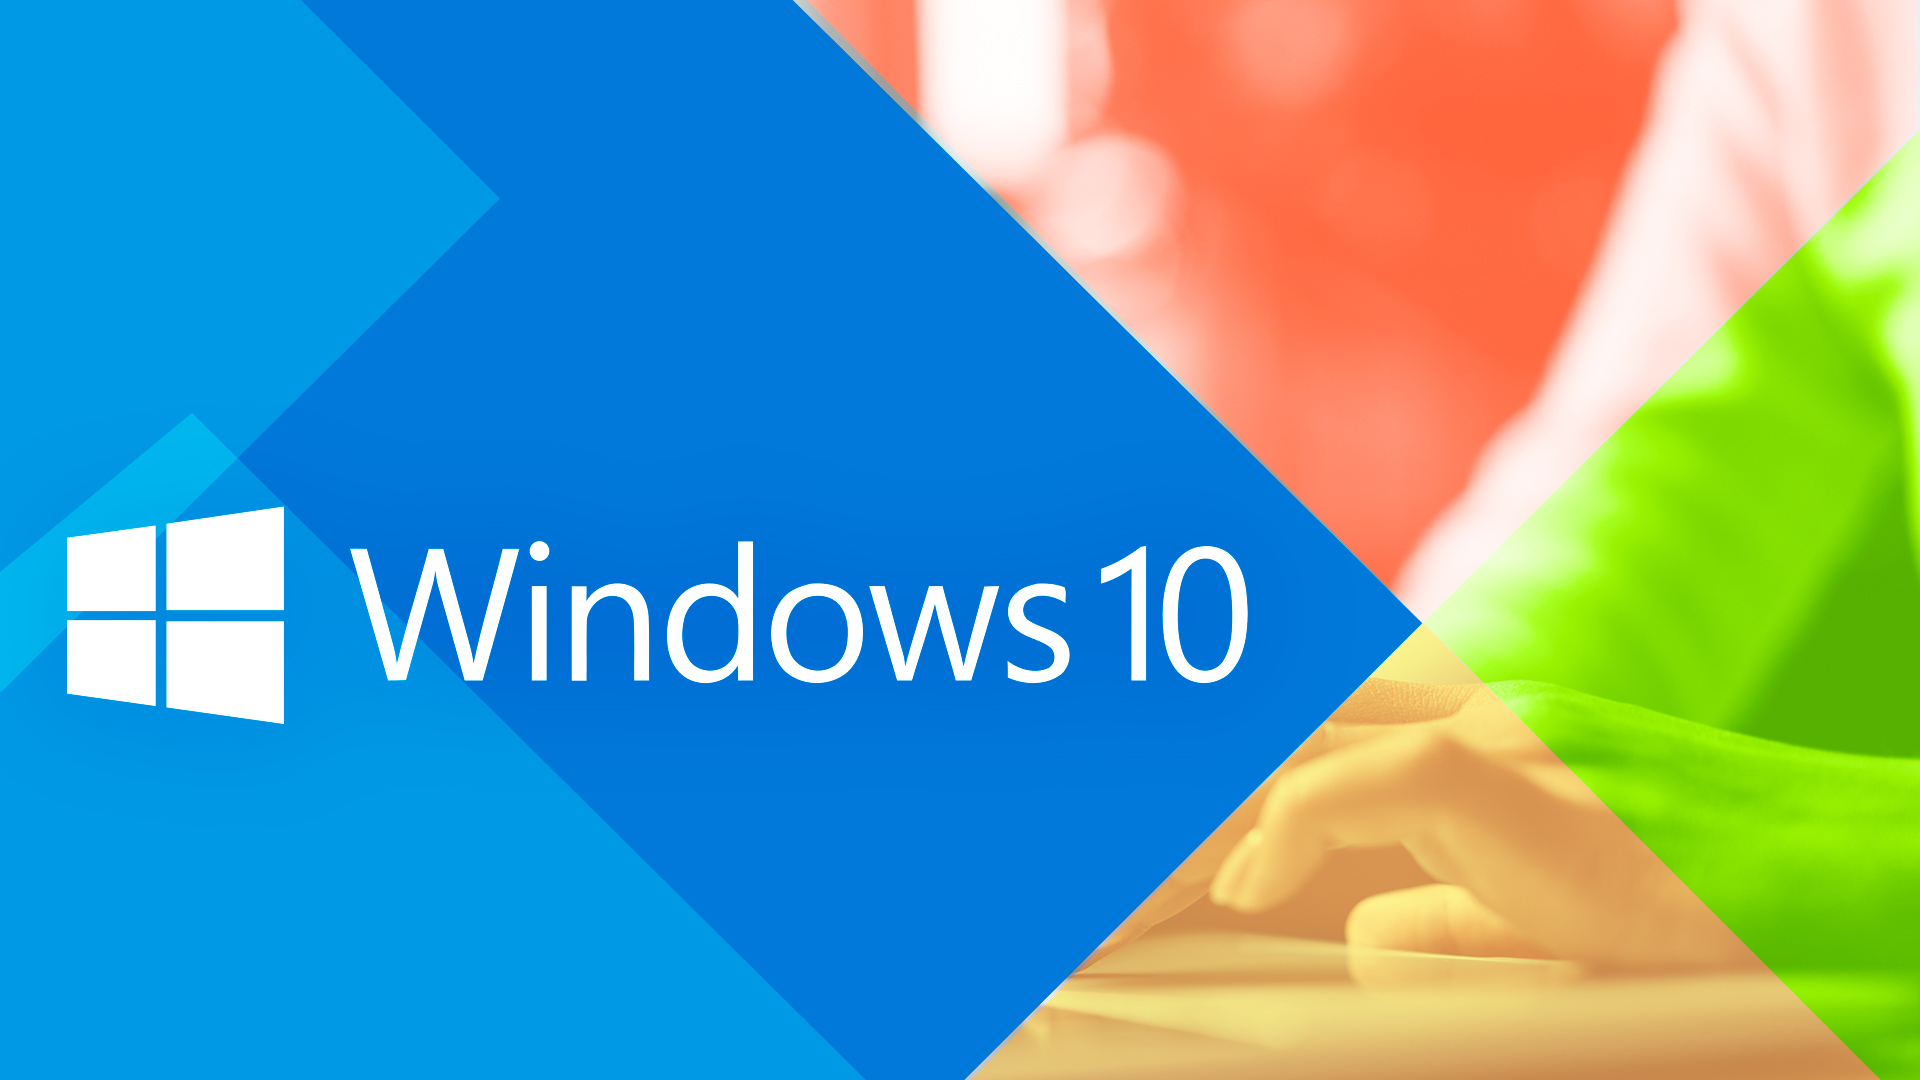 Microsoft, Betriebssystem, Windows 10, Windows 10 Logo